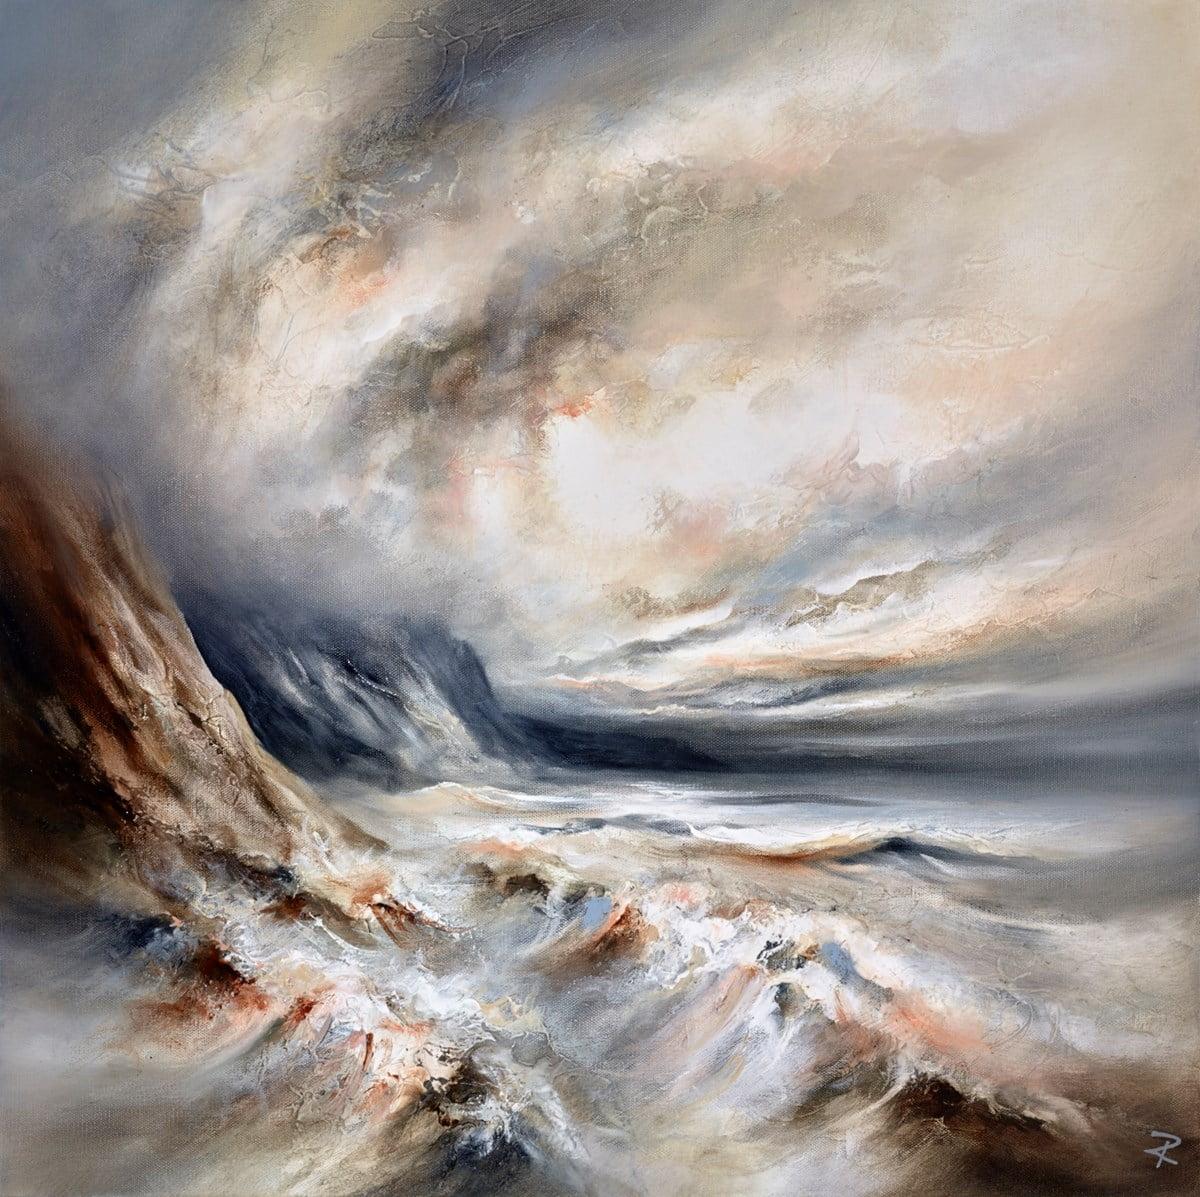 Pending Storm II ~ Chris and Steve Rocks